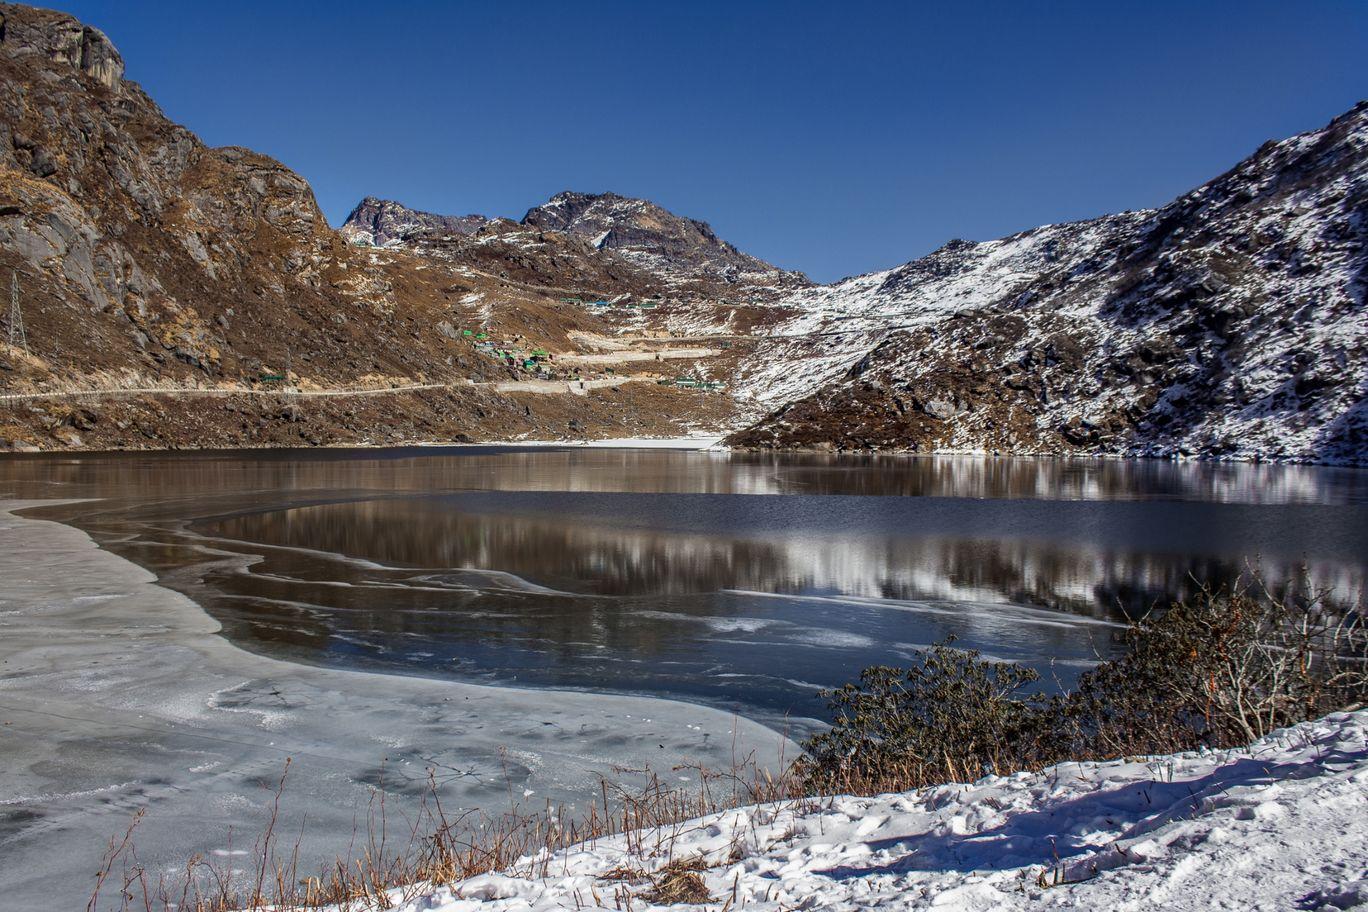 Photo of Tsomgo Lake By NIKHIL KERKETTA